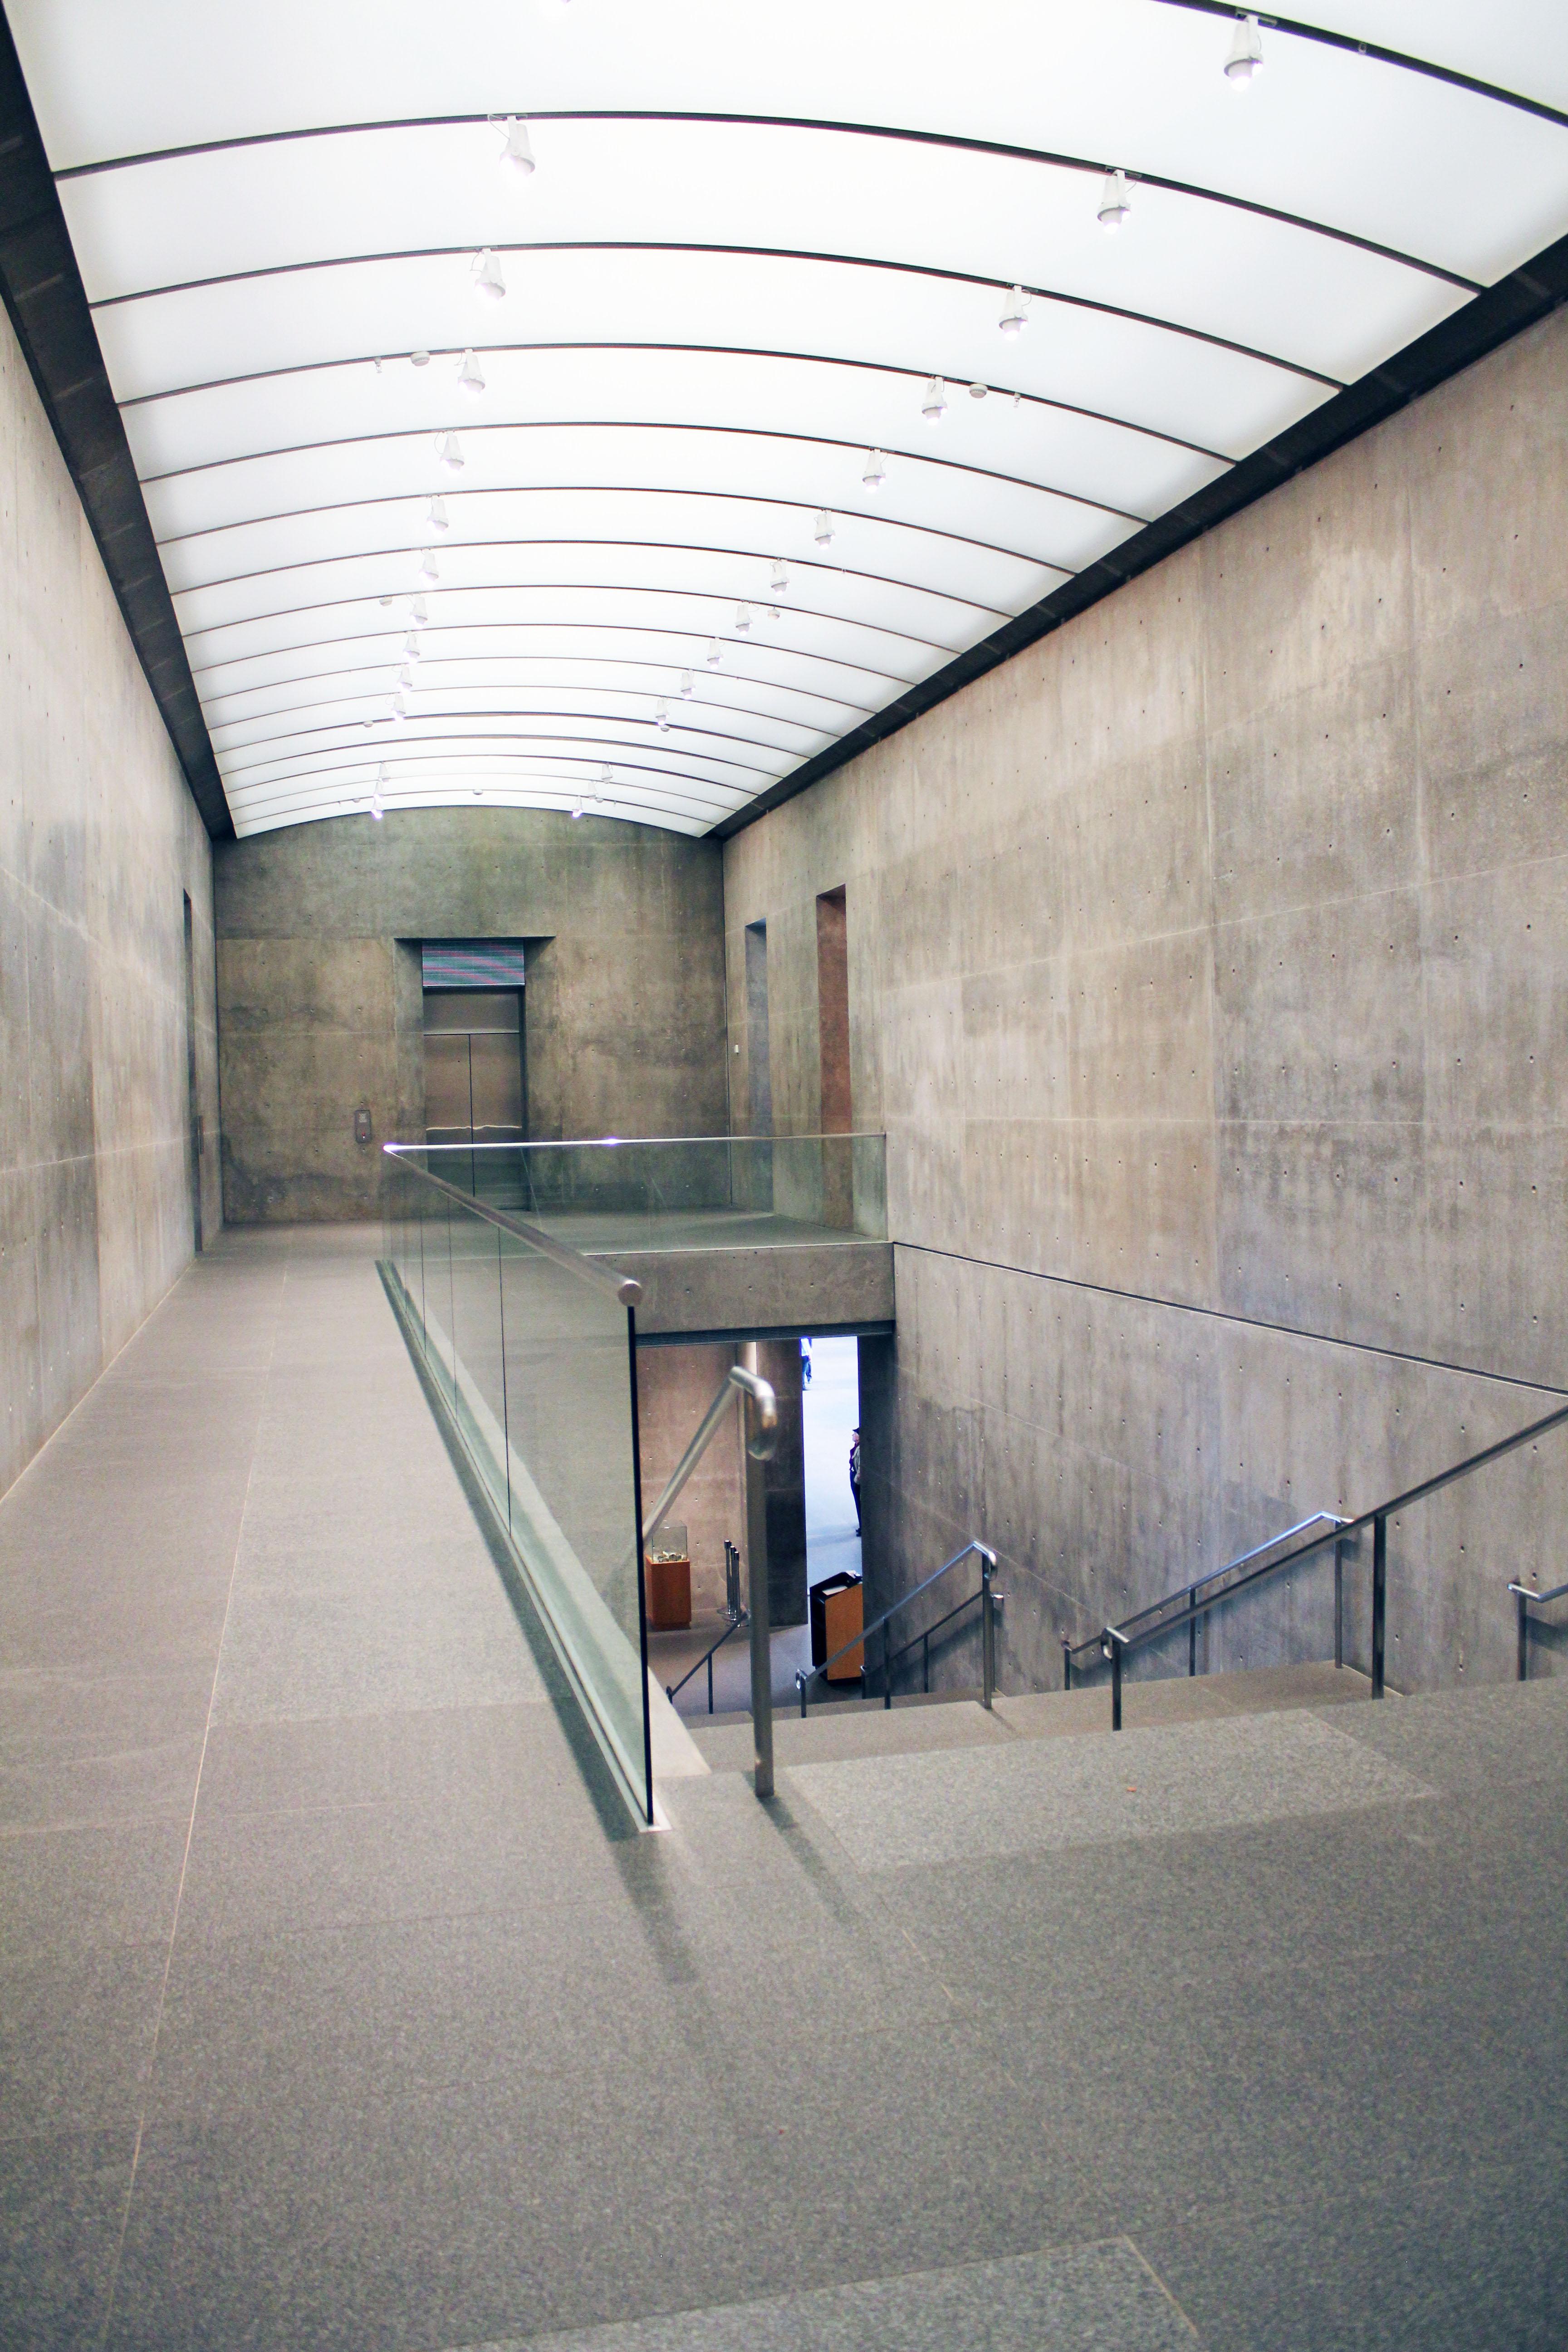 MoMA, Fort Worth - Photo Essay by Amit Khanna (16).JPG